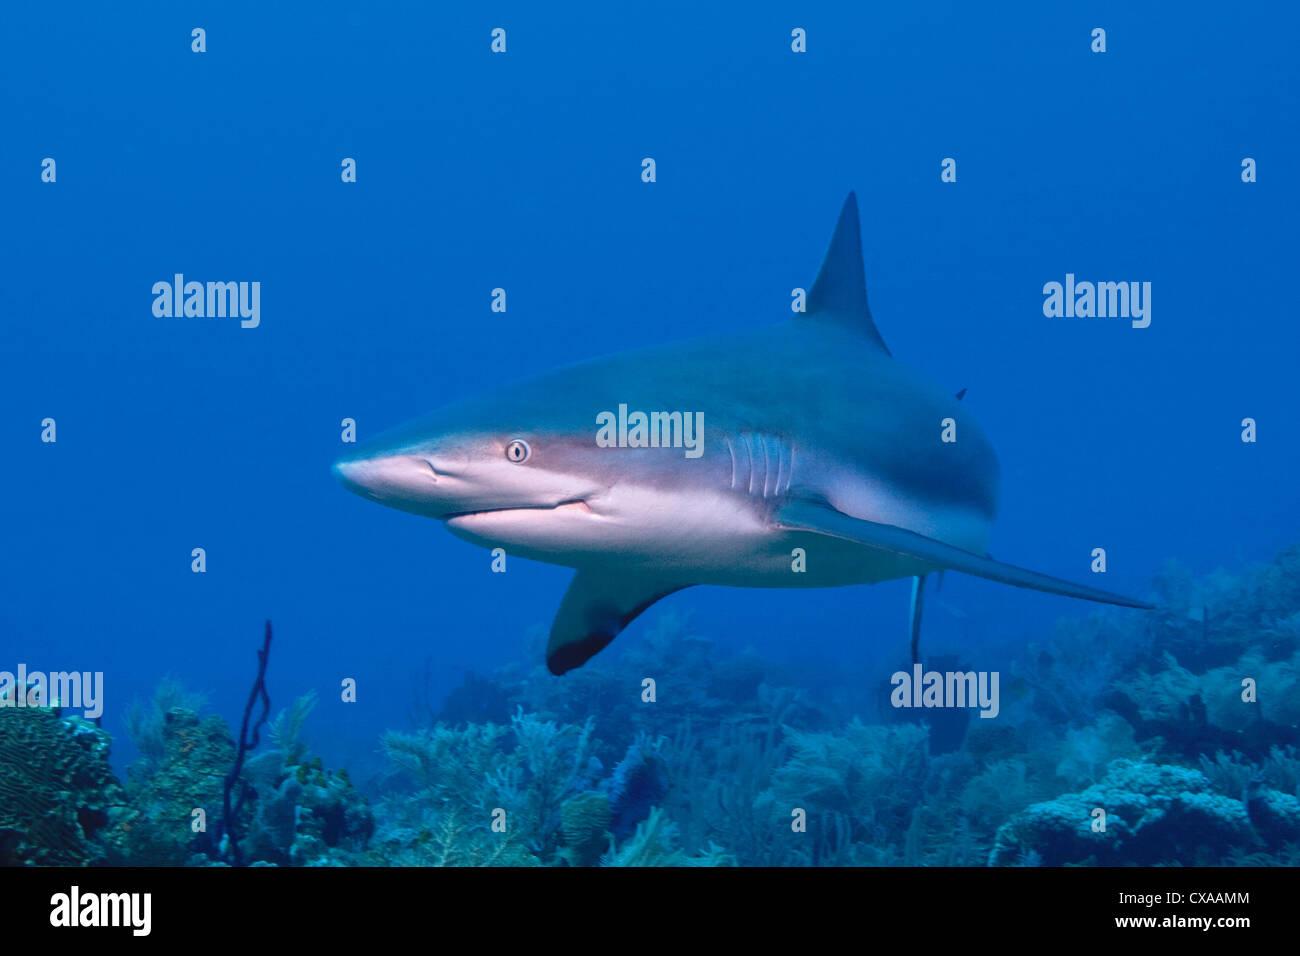 A Caribbean Reef Shark (Carcharhinus perezi) at the Swan Islands off the coast of Honduras. Stock Photo